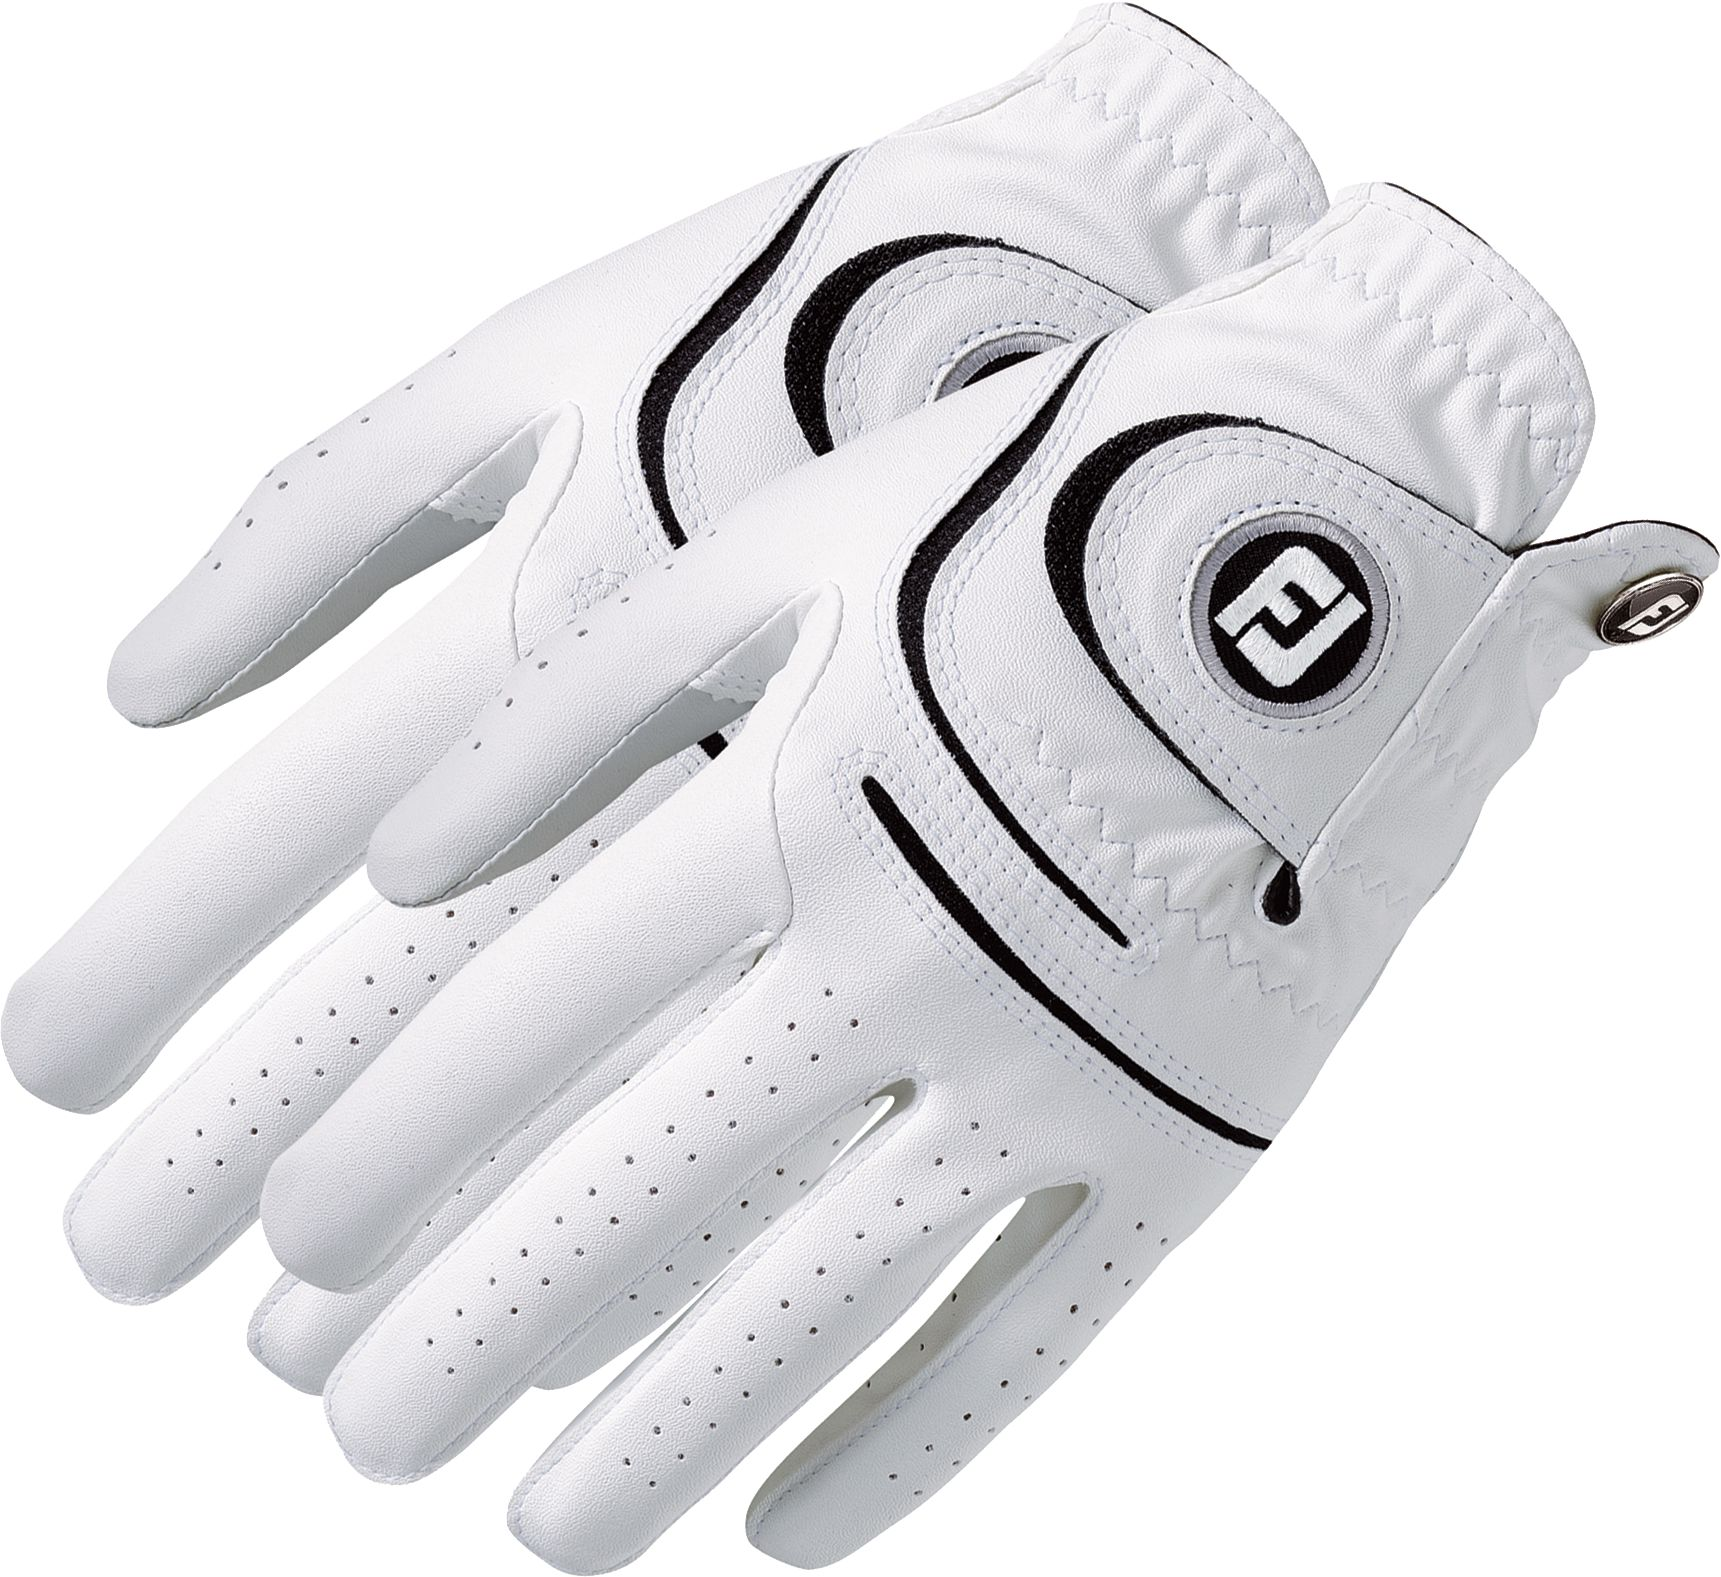 Black leather golf gloves - Product Image Footjoy Men S Weathersof Golf Glove 2 Pack